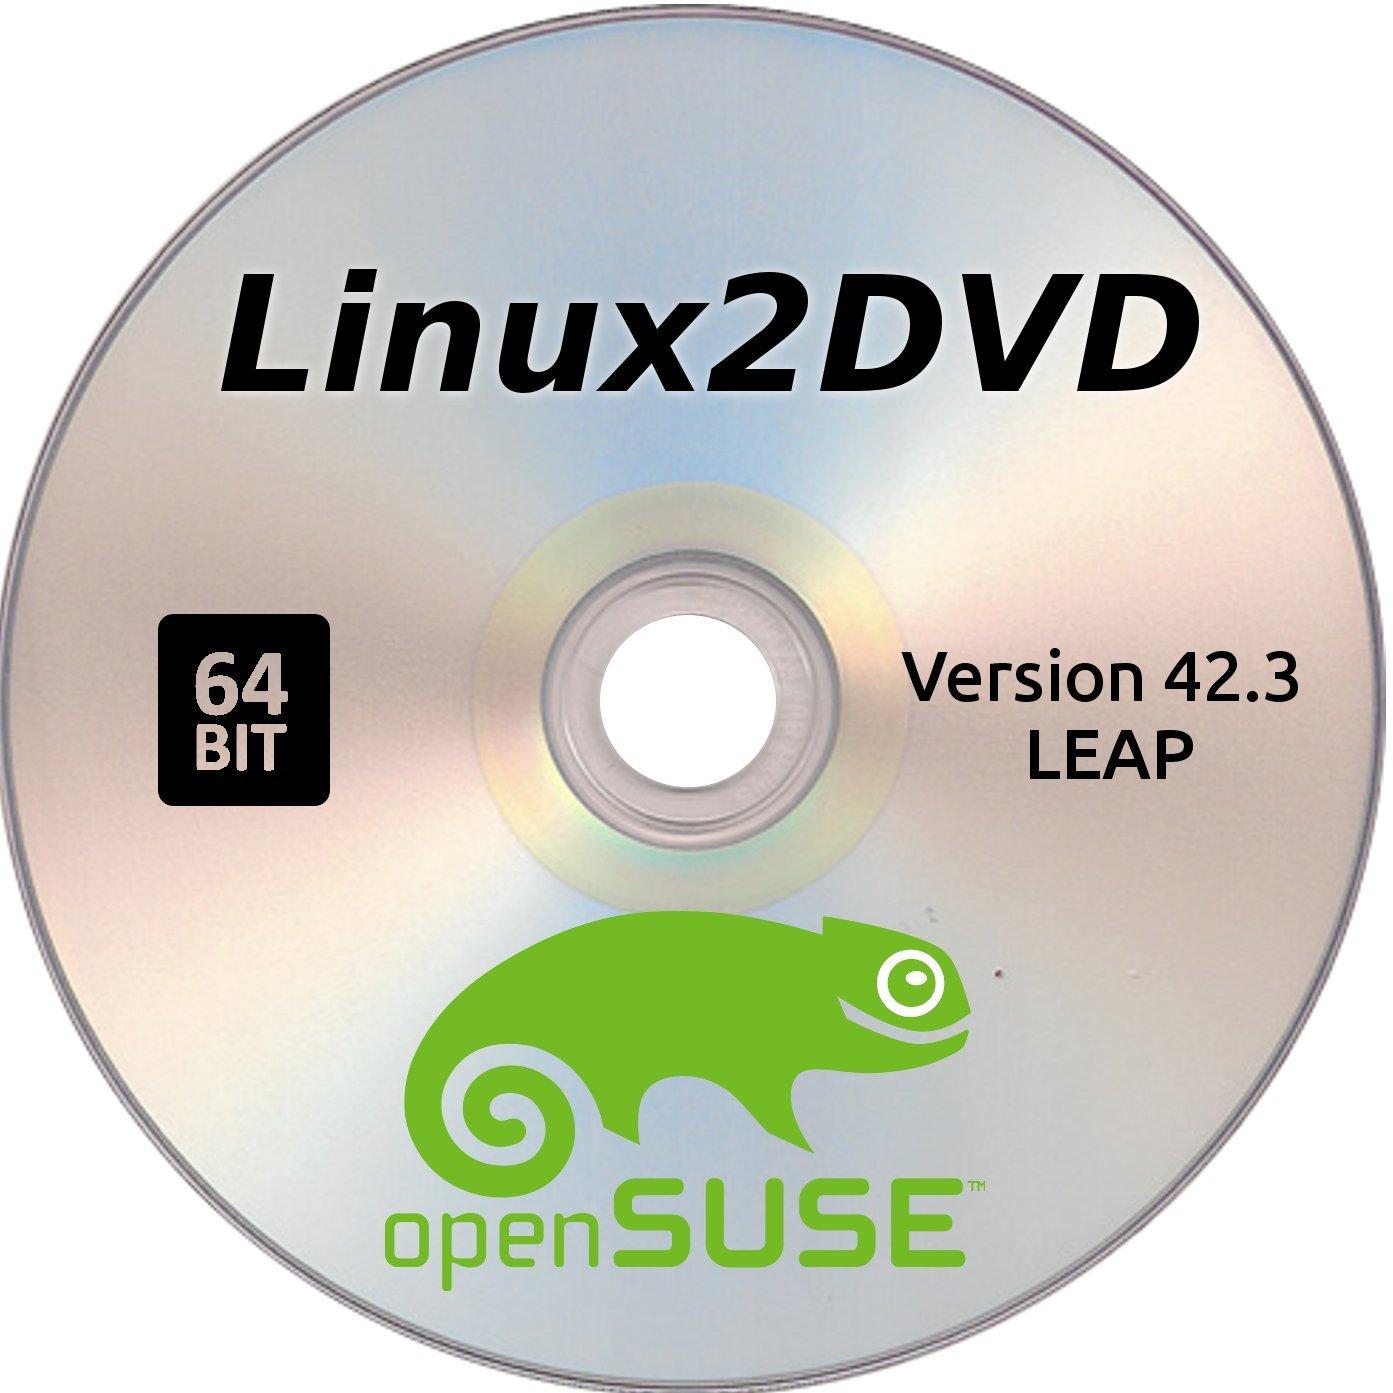 Amazon com: openSUSE Leap version 42 3, SuSE 64 Bit Linux OS